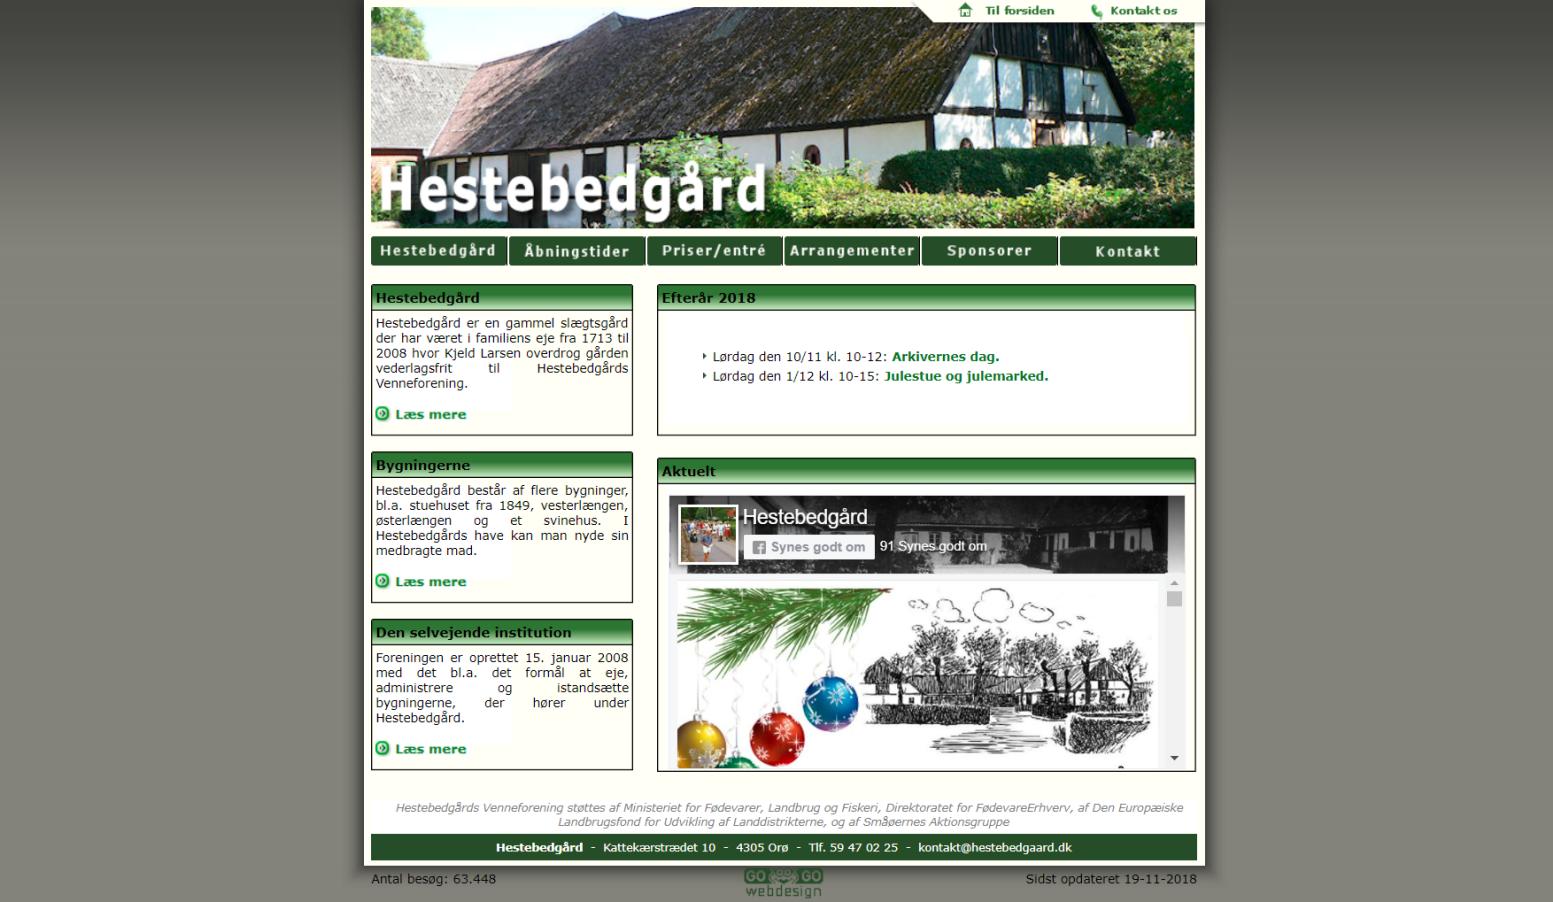 hestebedgaard.dk